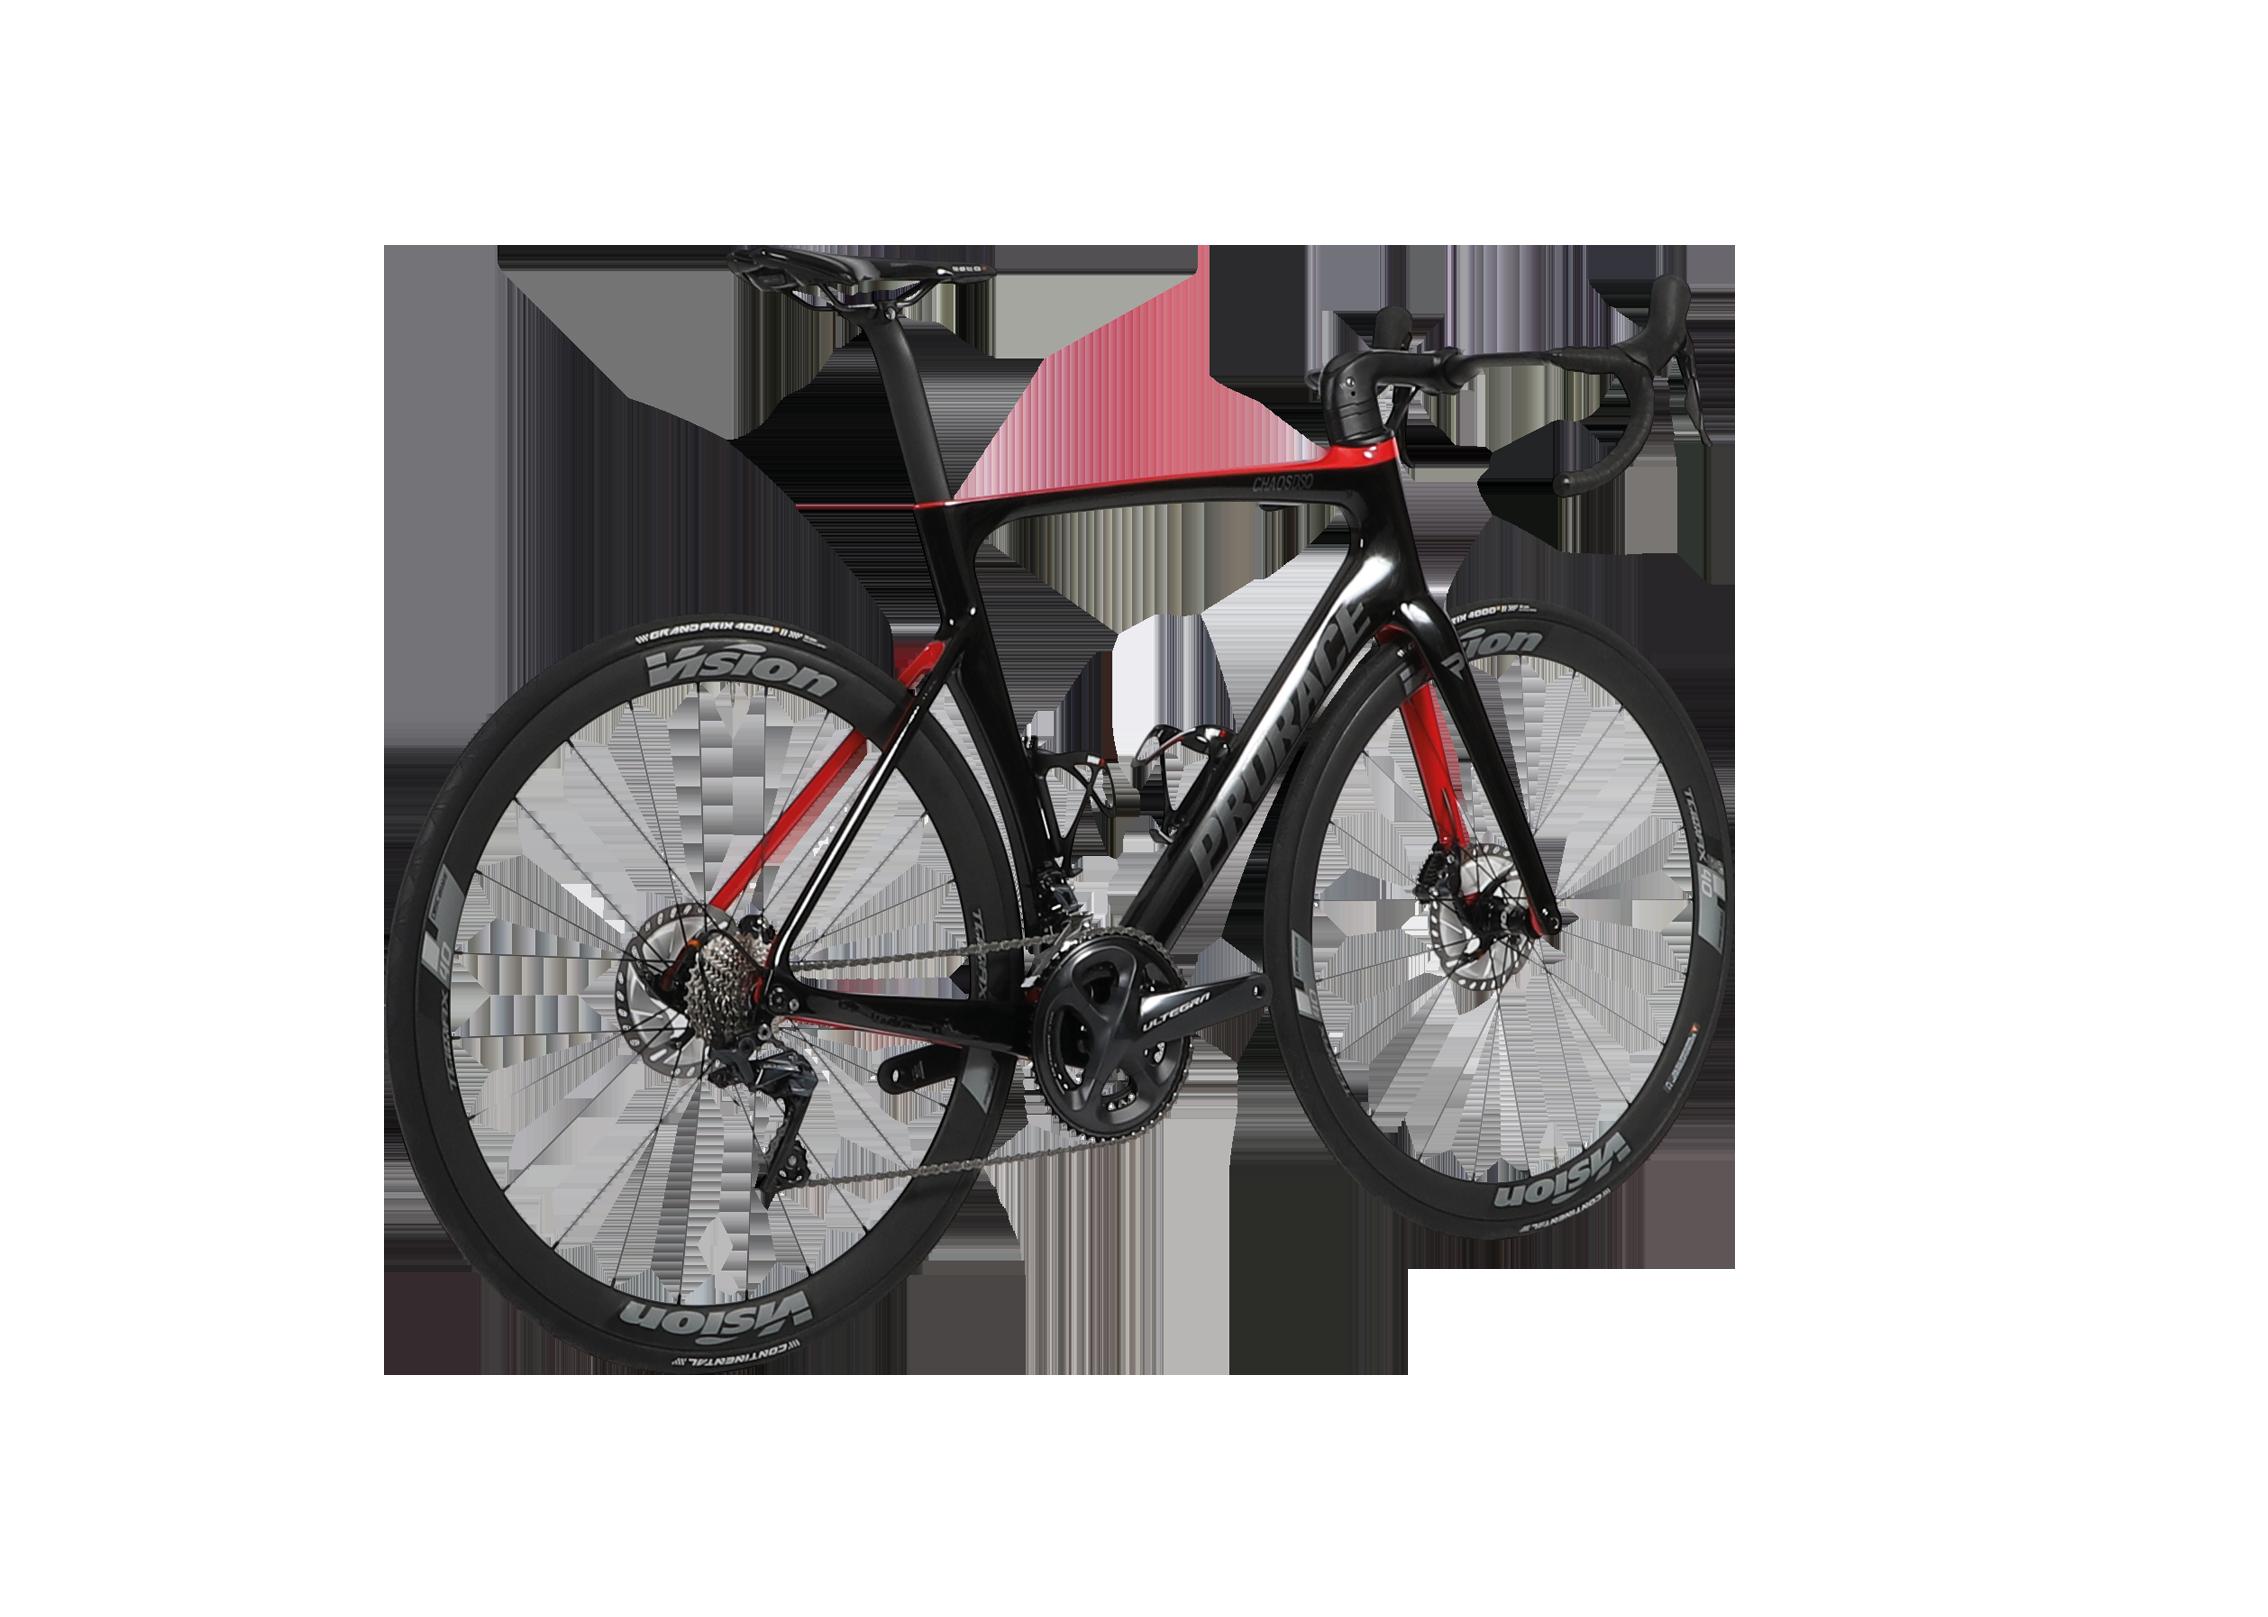 Chaos DSQ aerodynamische Prorace fiets met schijfremmen achteraanzicht